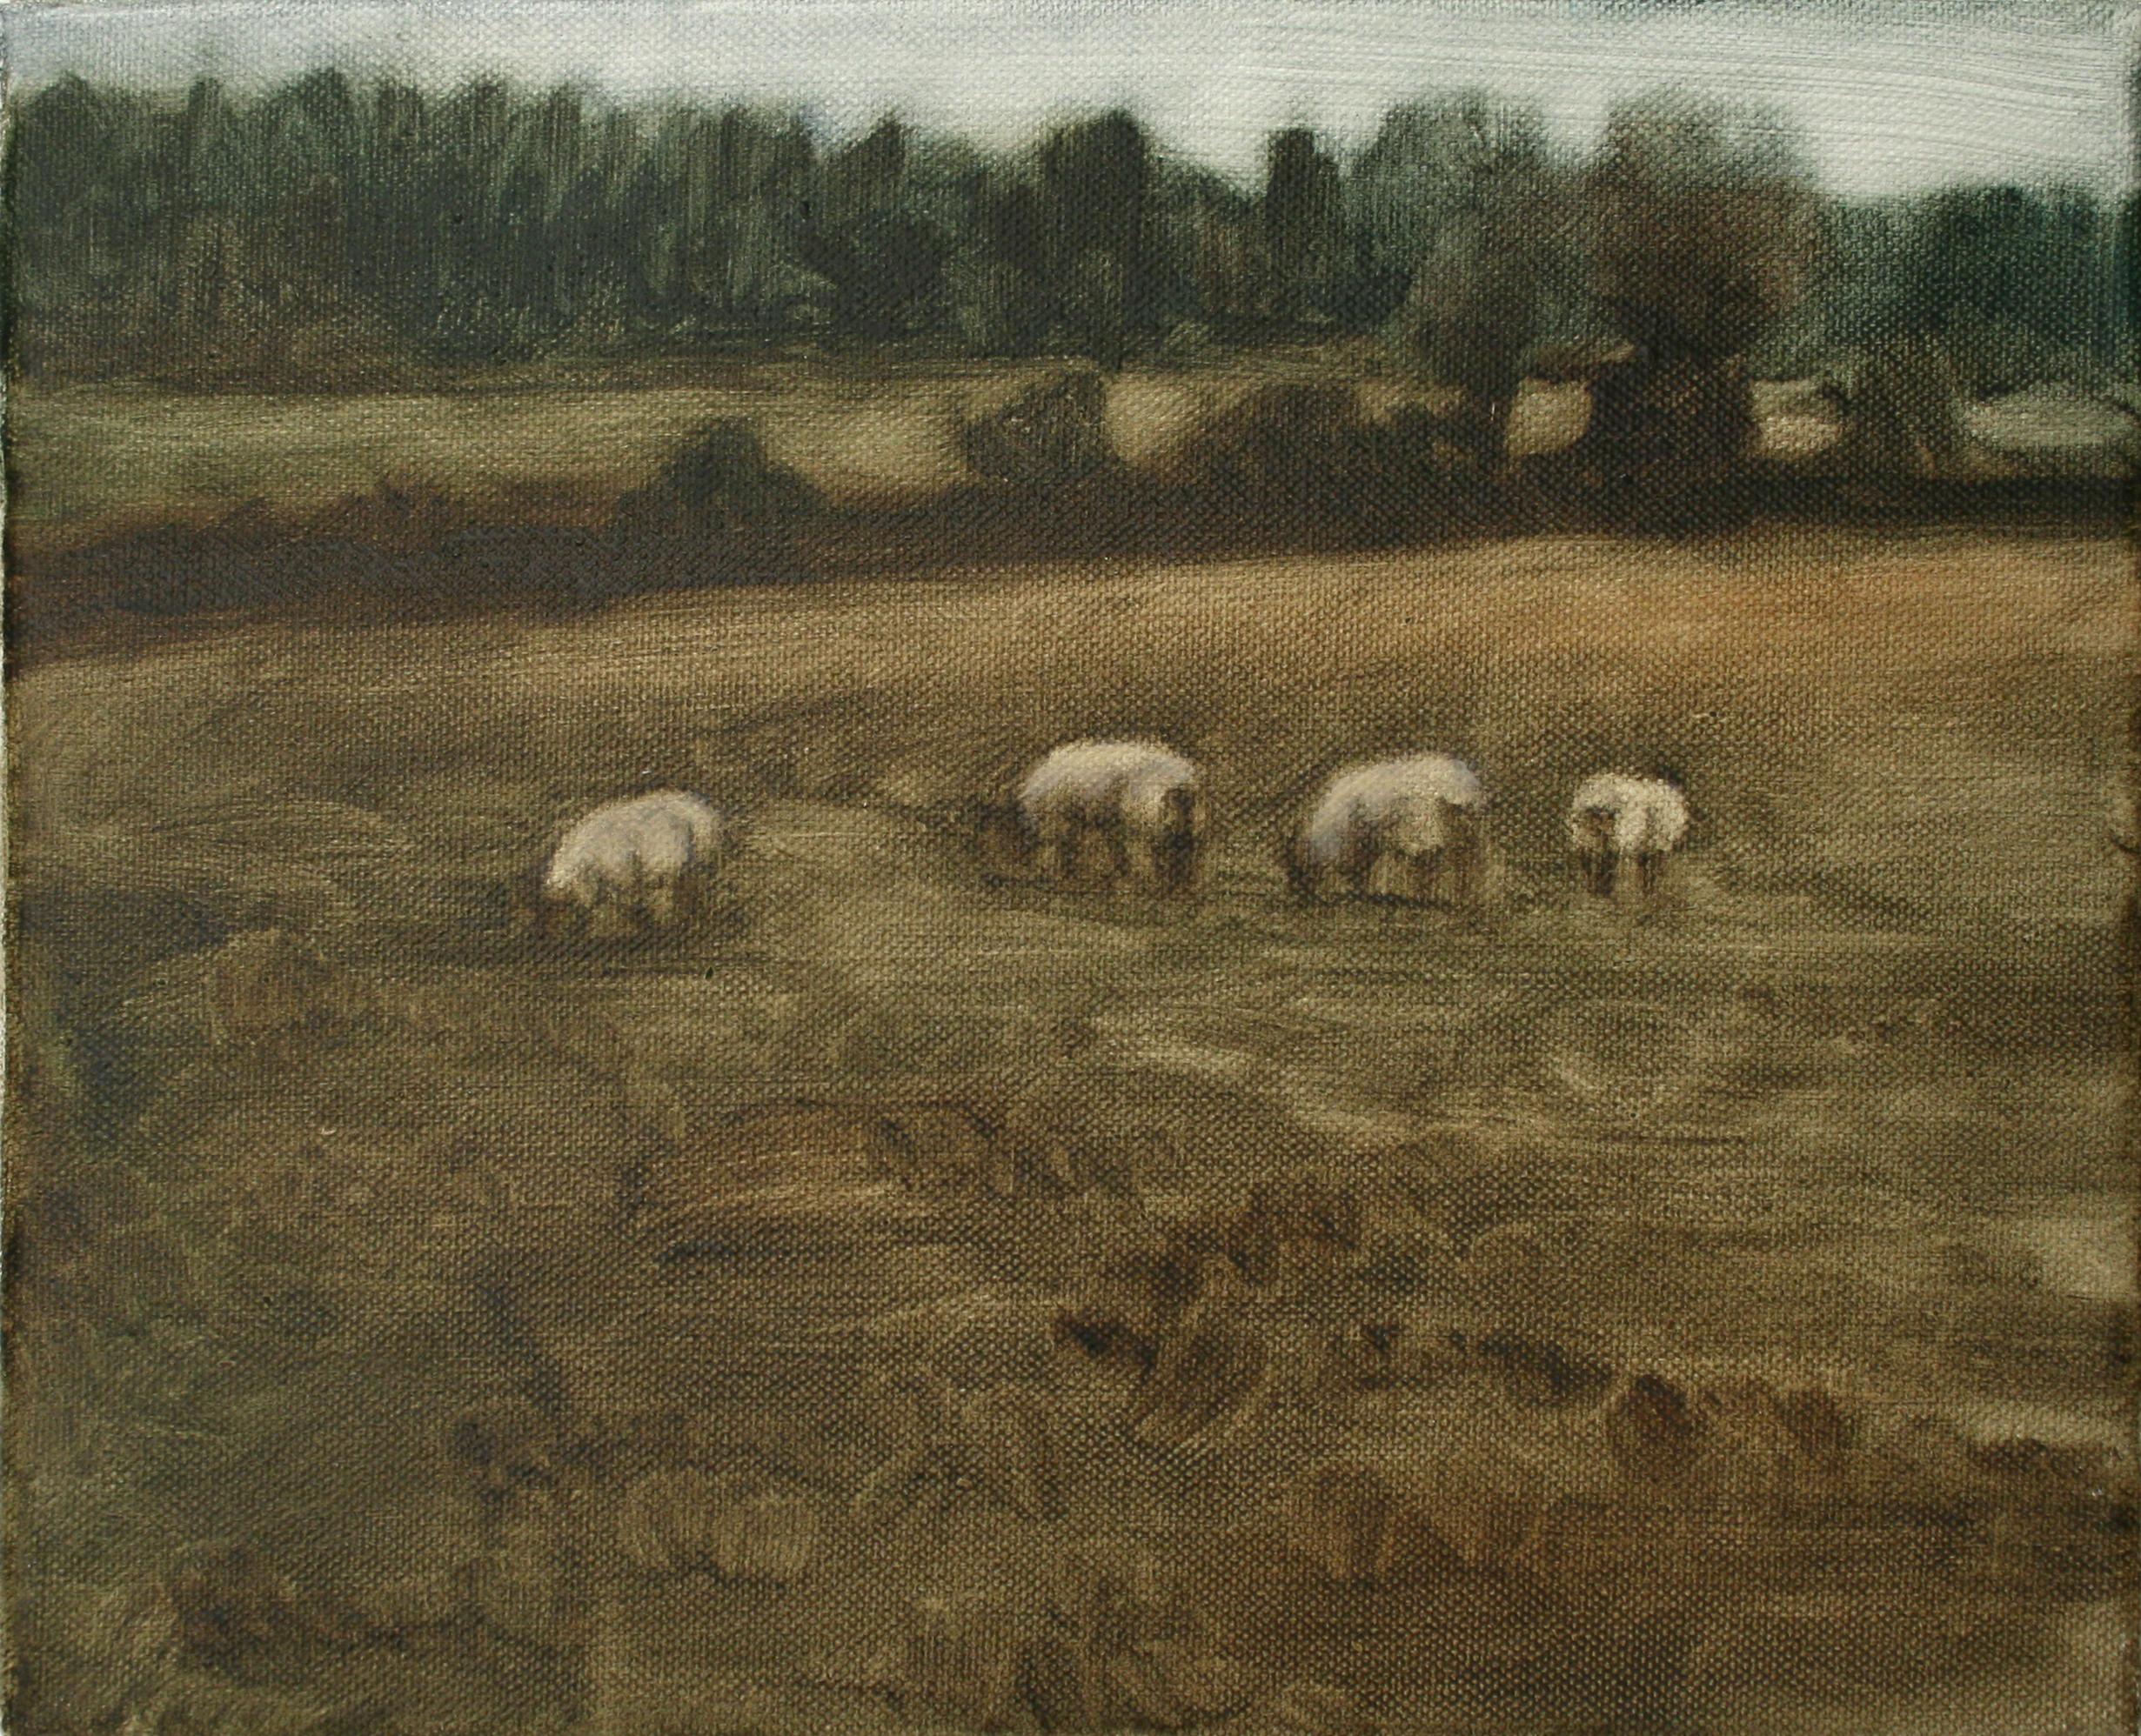 "Sheep Study 9, oil on canvas 30 x 24.5 cm (12"" x 9.5""), 2016"